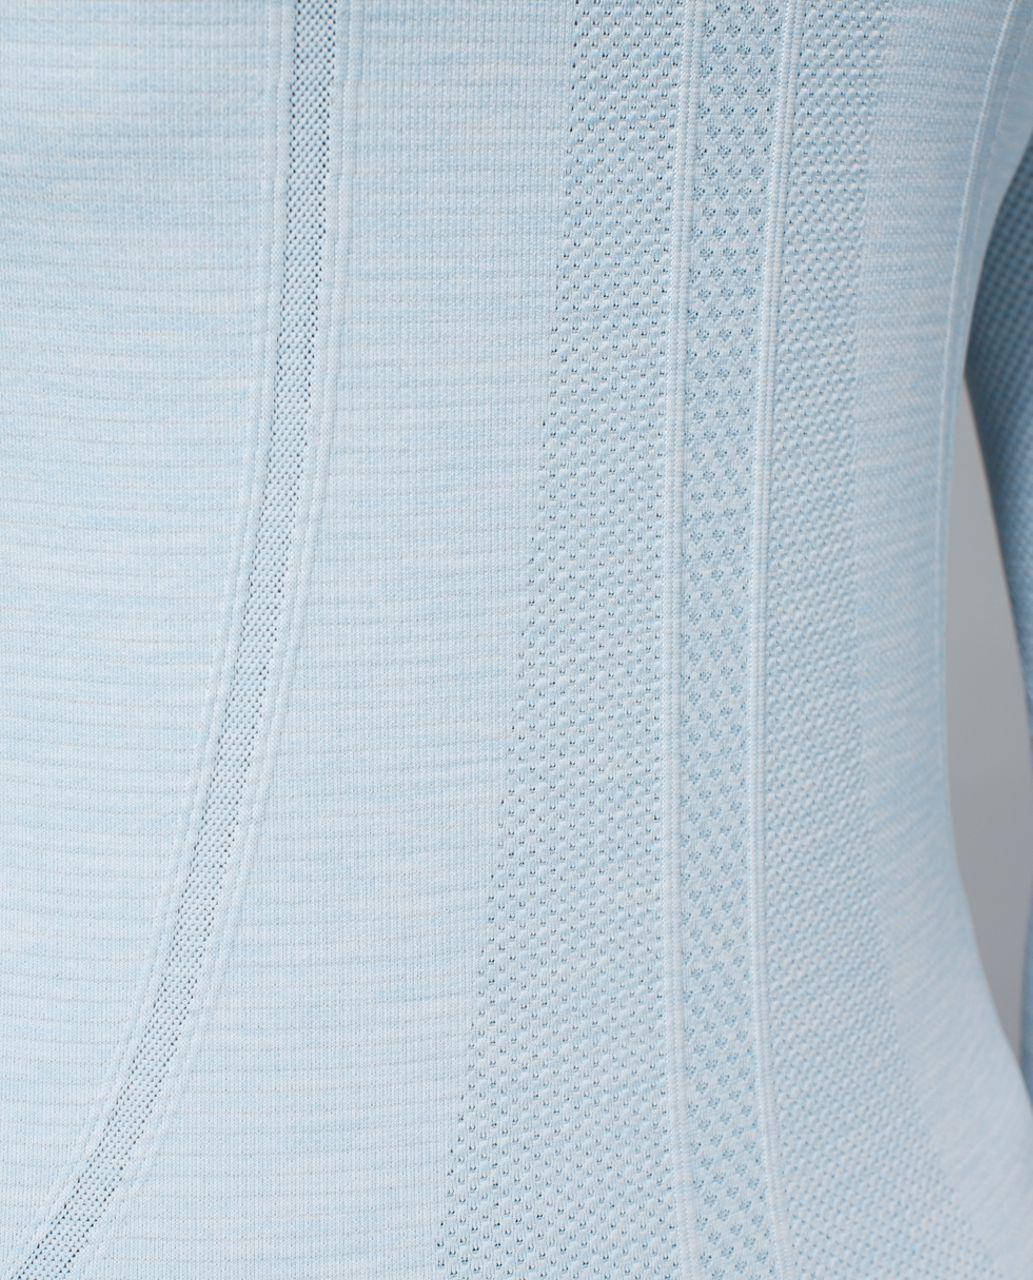 Lululemon Run:  Swiftly Tech Long Sleeve Crew - Space Dye Heathered Caspian Blue